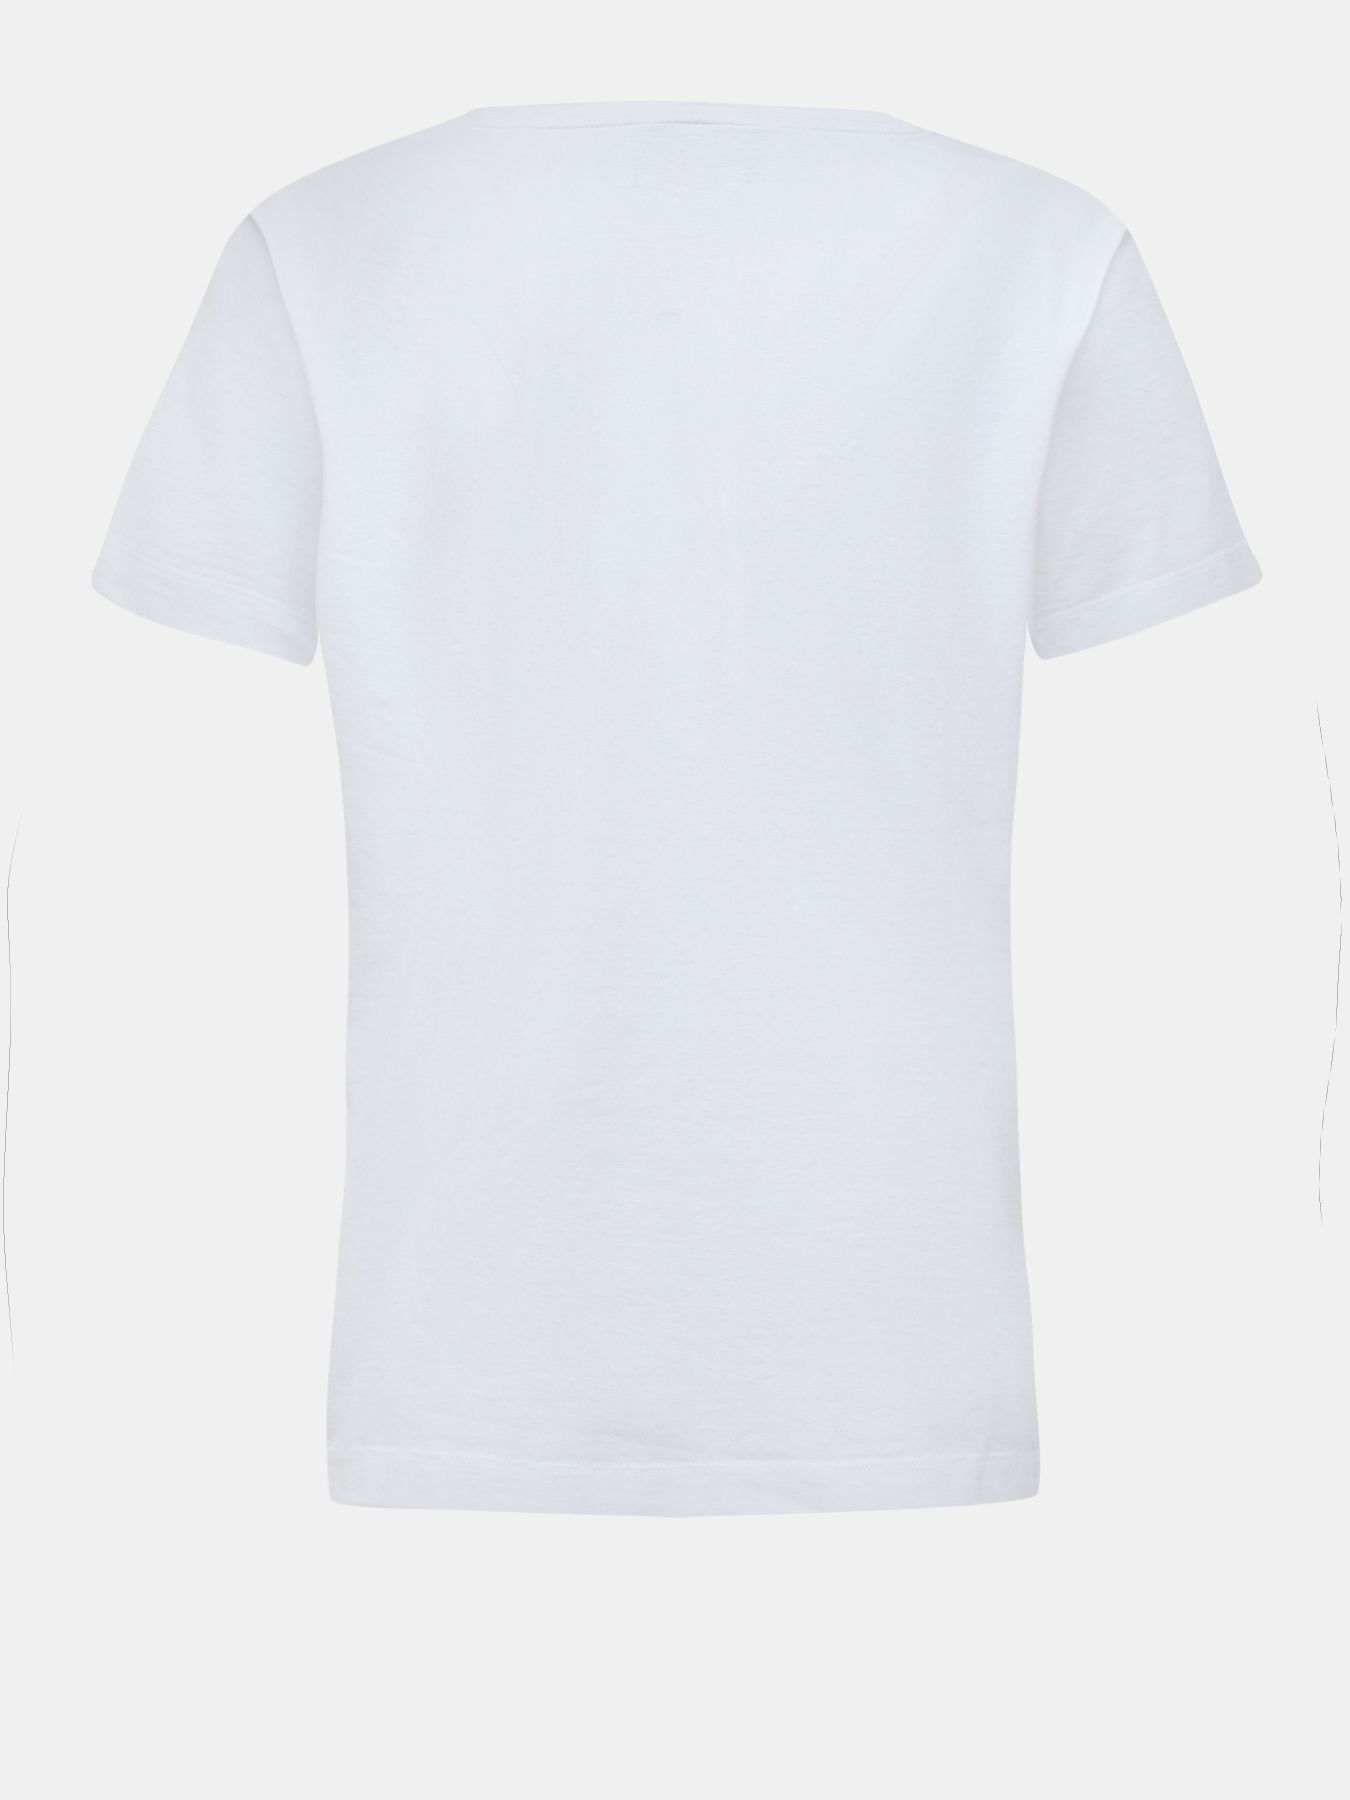 Фуфайка (футболка) Persona by Marina Rinaldi Футболка plus size